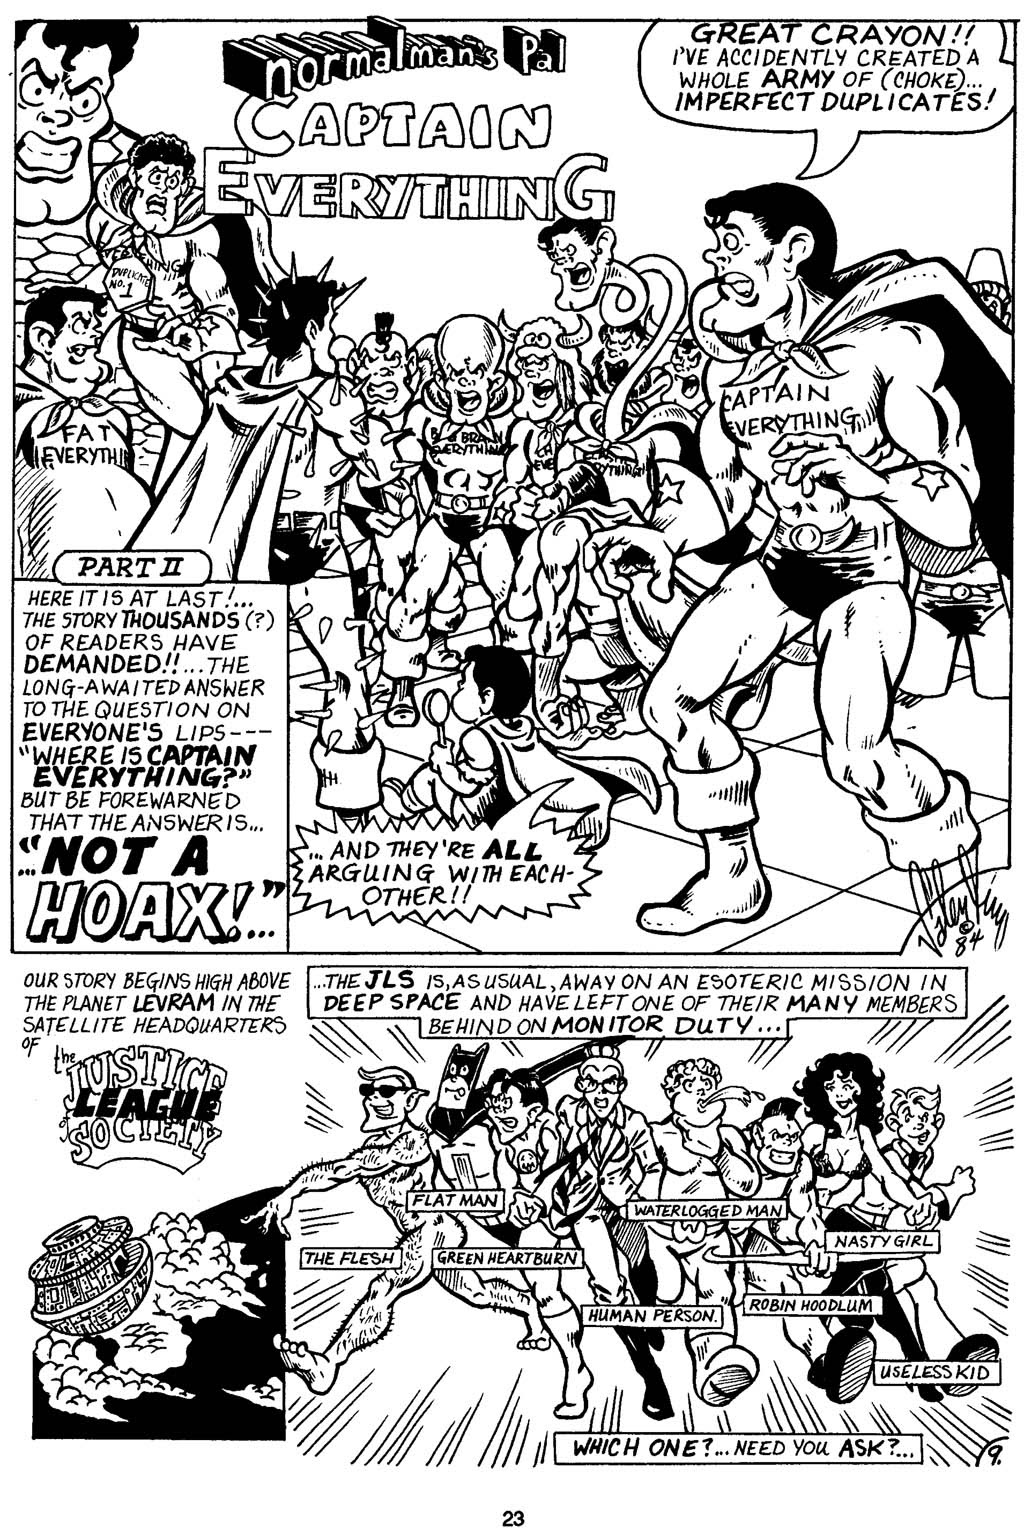 Read online Normalman - The Novel comic -  Issue # TPB (Part 1) - 28